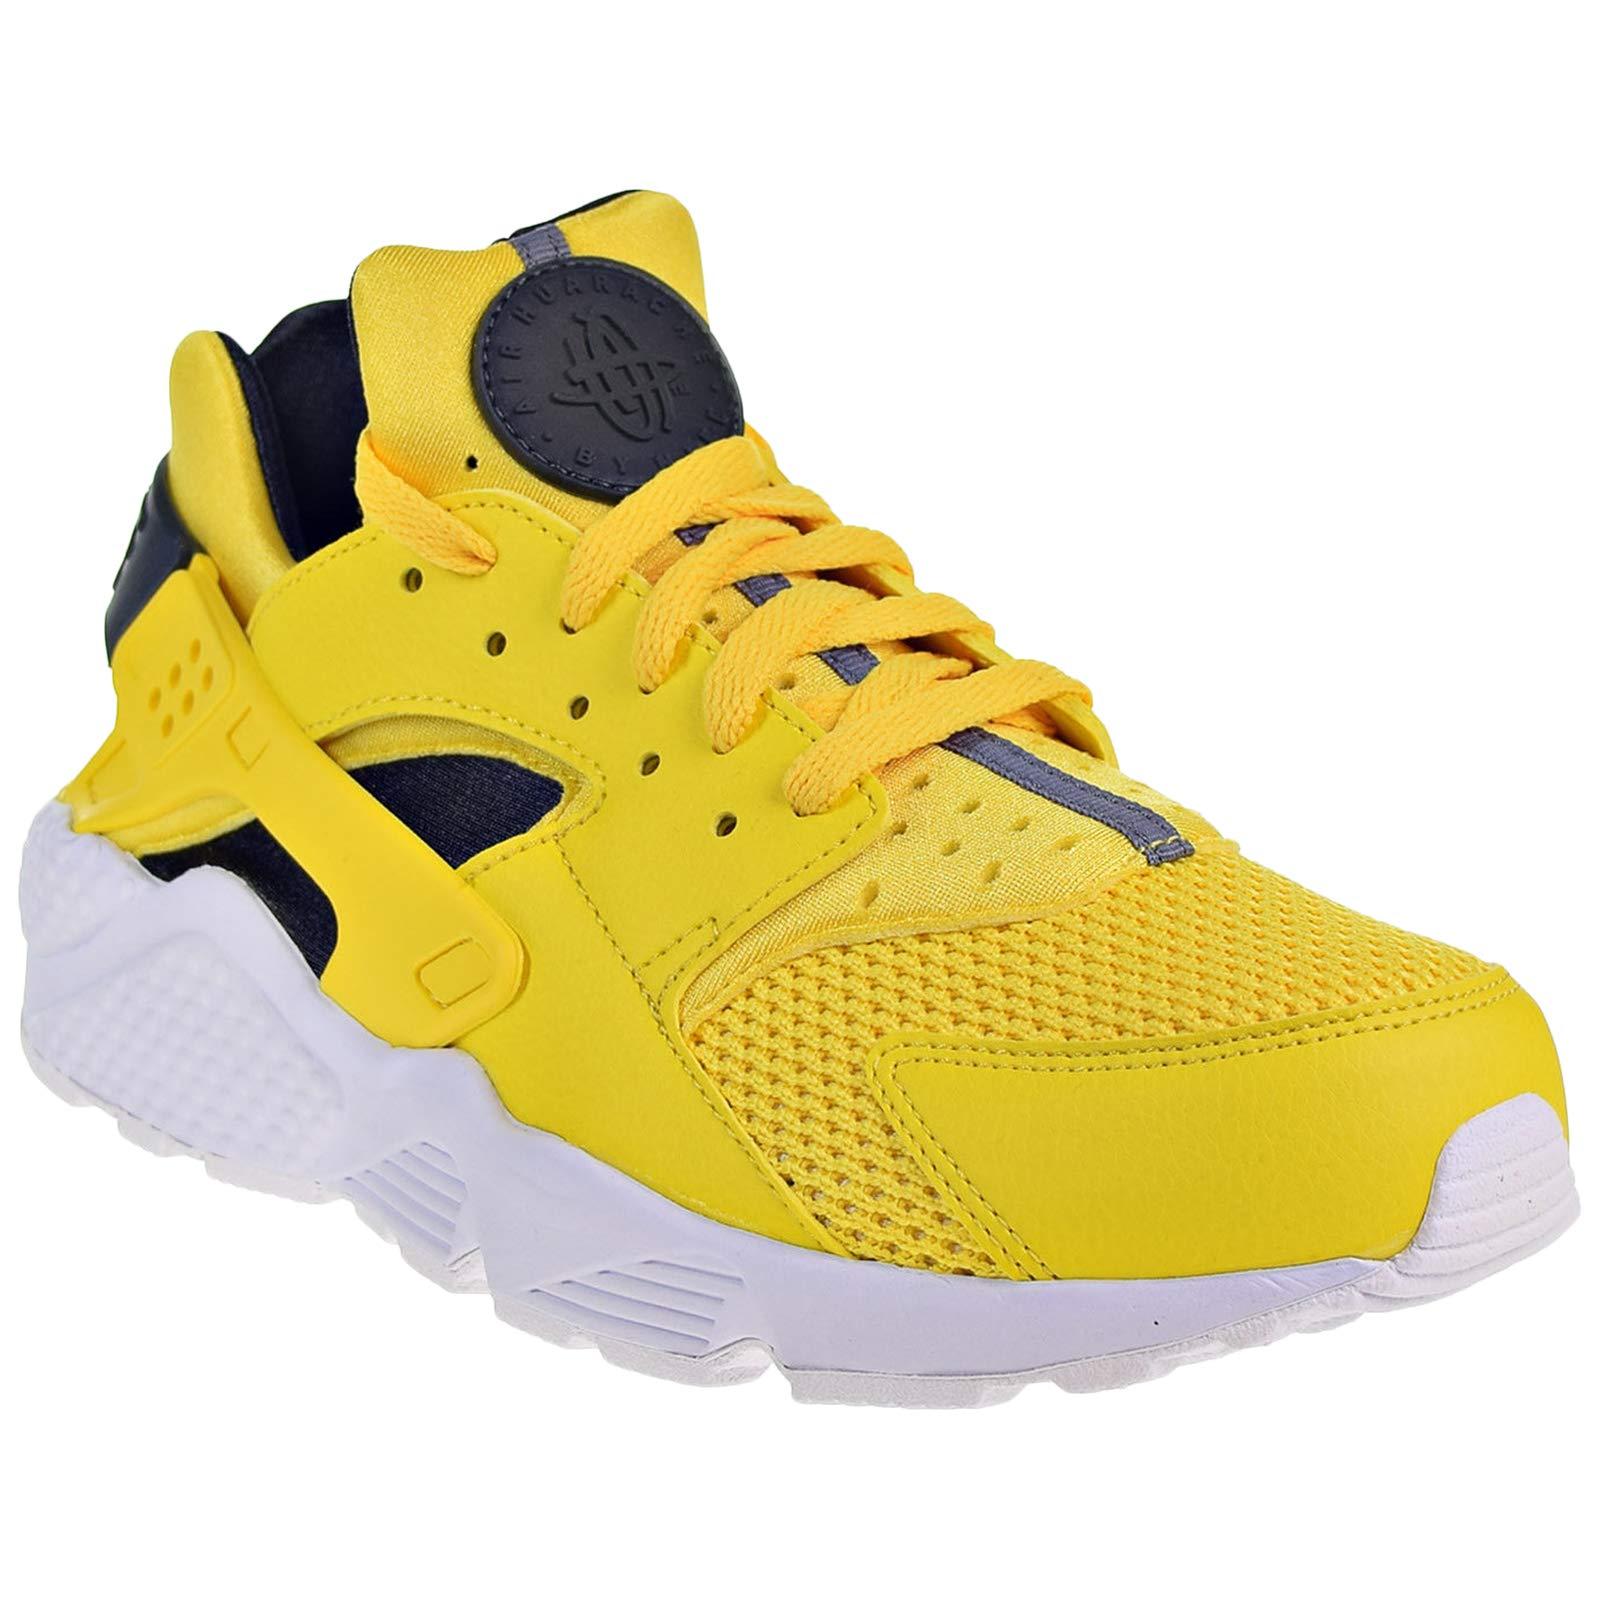 a8788830da79 Galleon - NIKE Air Huarache Men s Running Shoes Tour Yellow Anthracite-White  318429-700 (10 D(M) US)